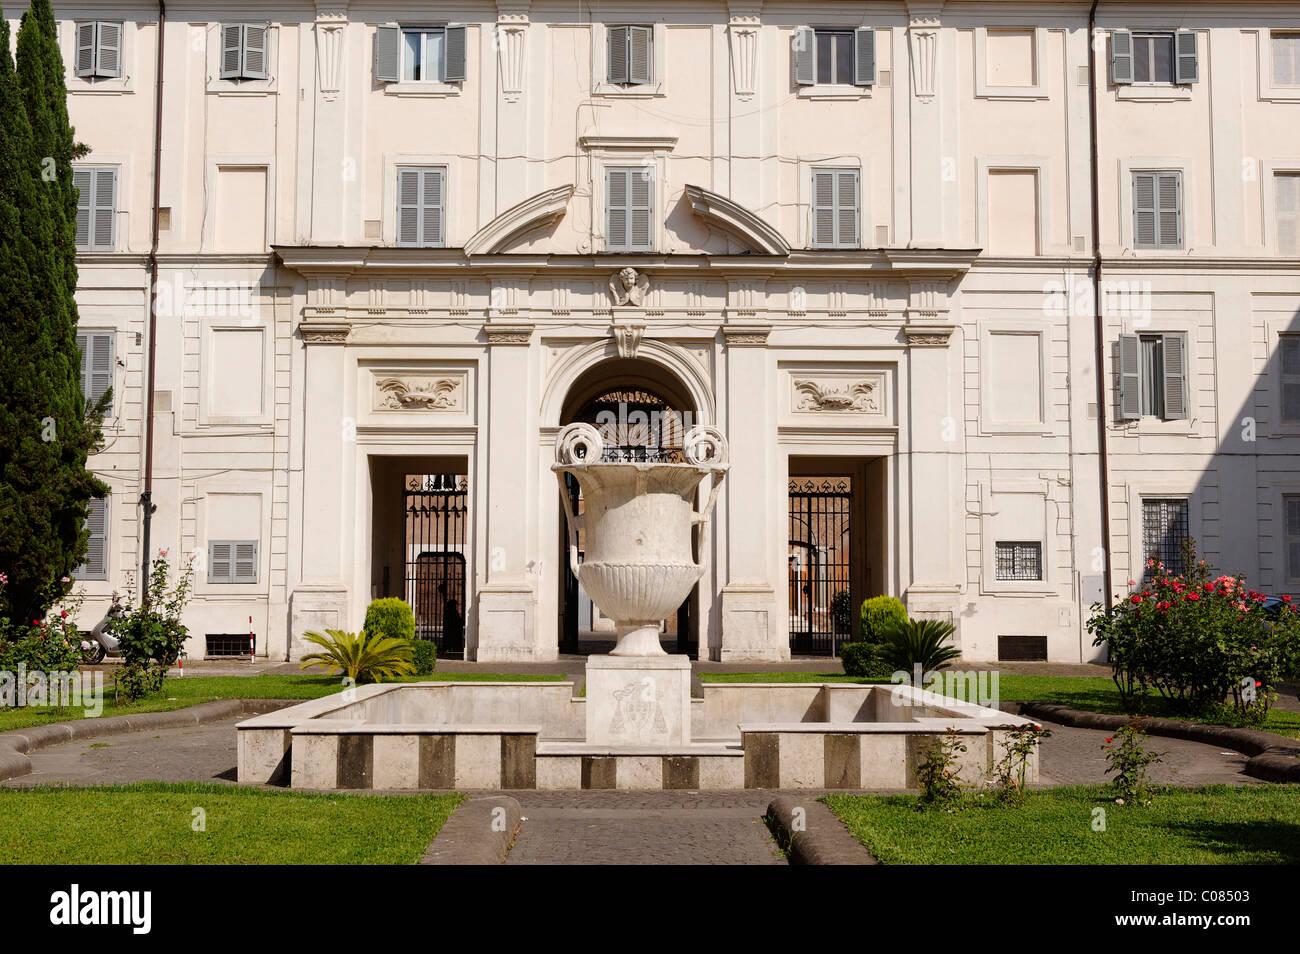 Église Santa Cecilia, Trastevere, Rome, Italie, Europa Photo Stock